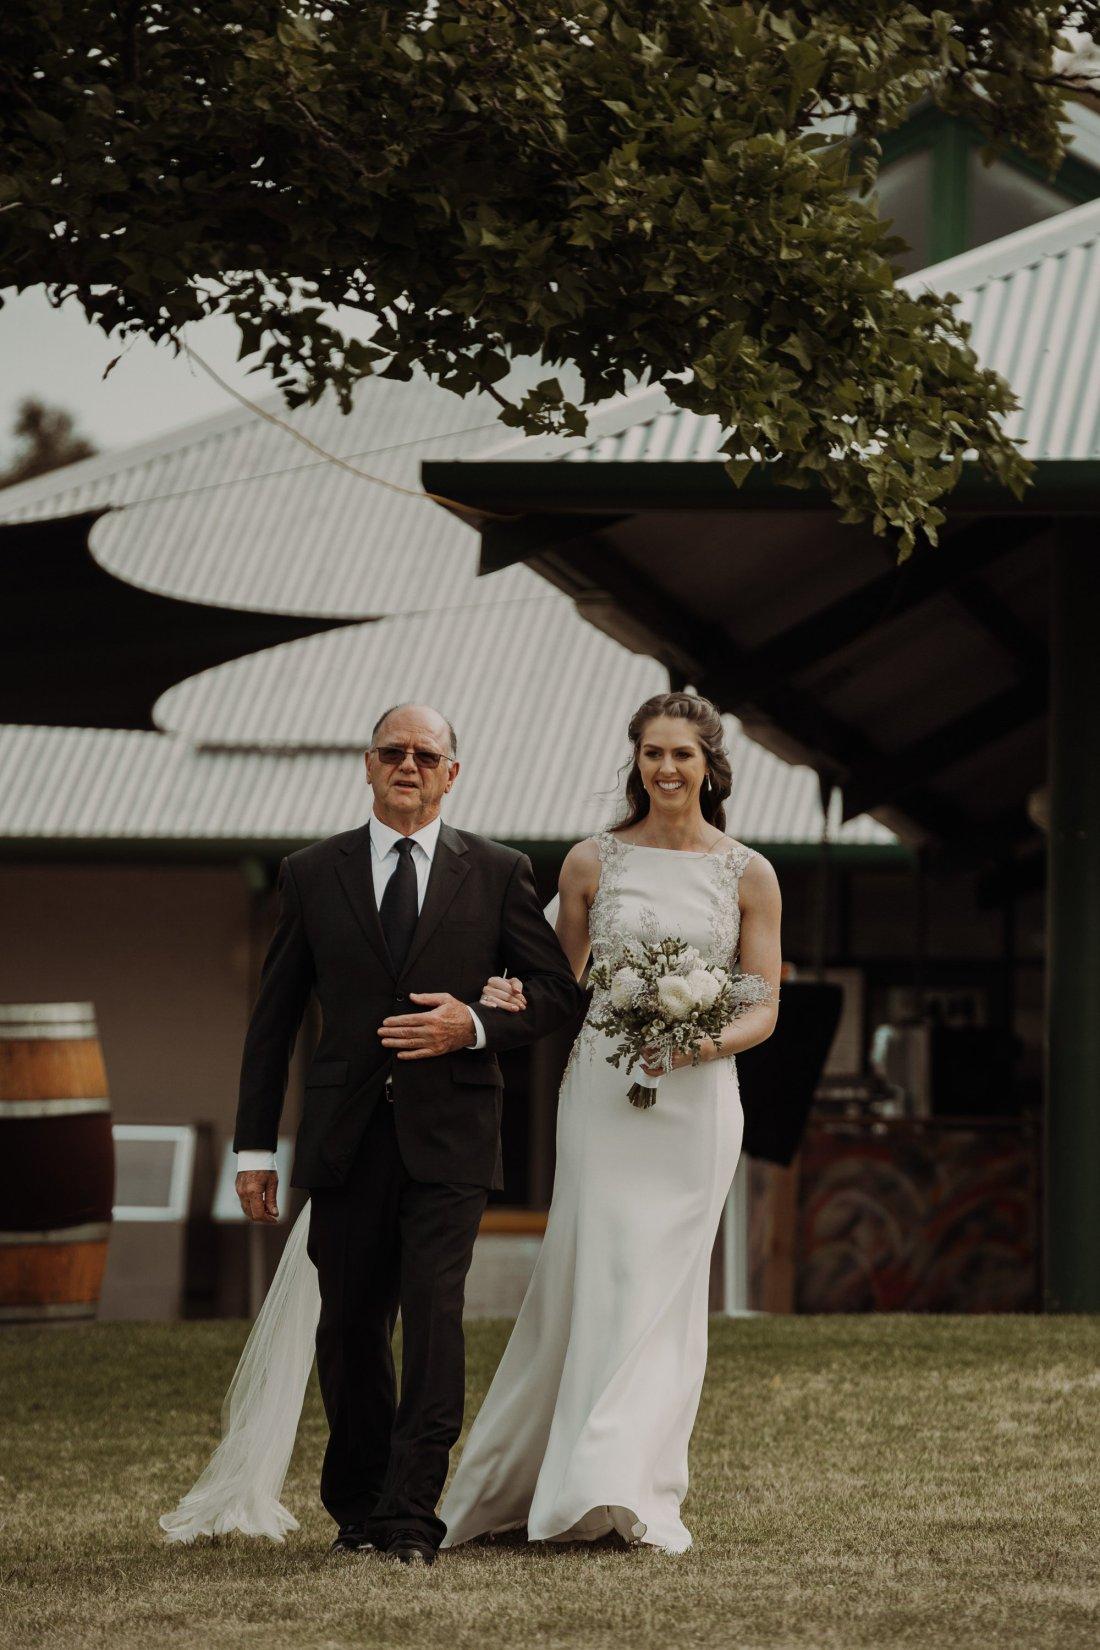 Pip + Mitch | Ebony Blush Photography | Perth Wedding Photographer | Perth Wedding Photos | Street Food Wedding | Fremantle Wedding Photos23